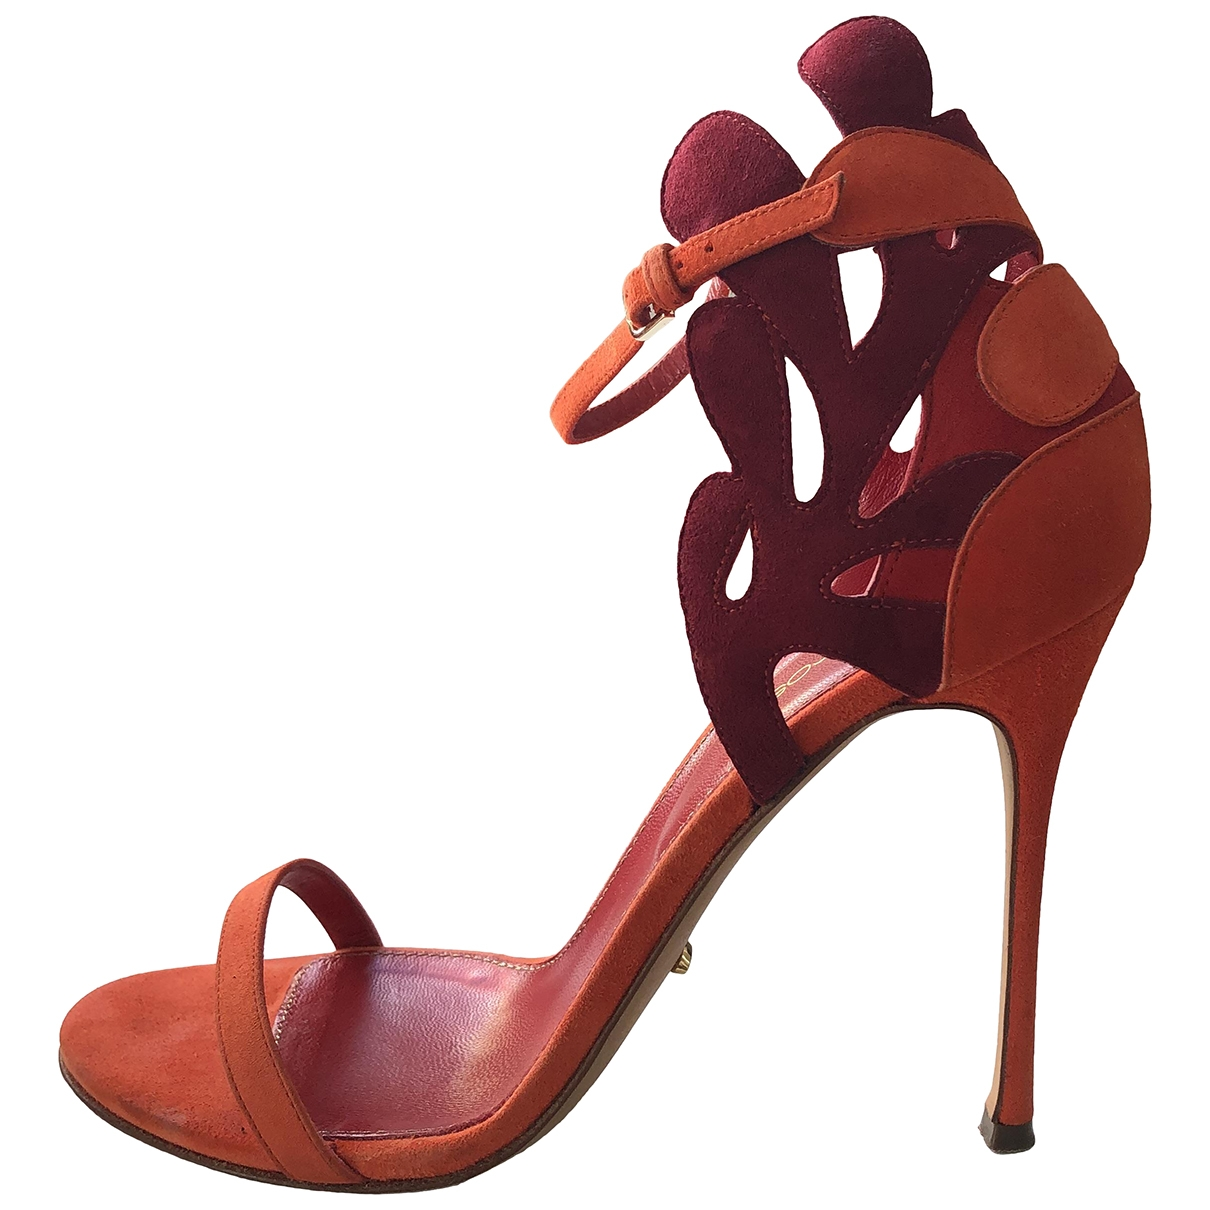 Sergio Rossi \N Orange Leather Sandals for Women 38 IT